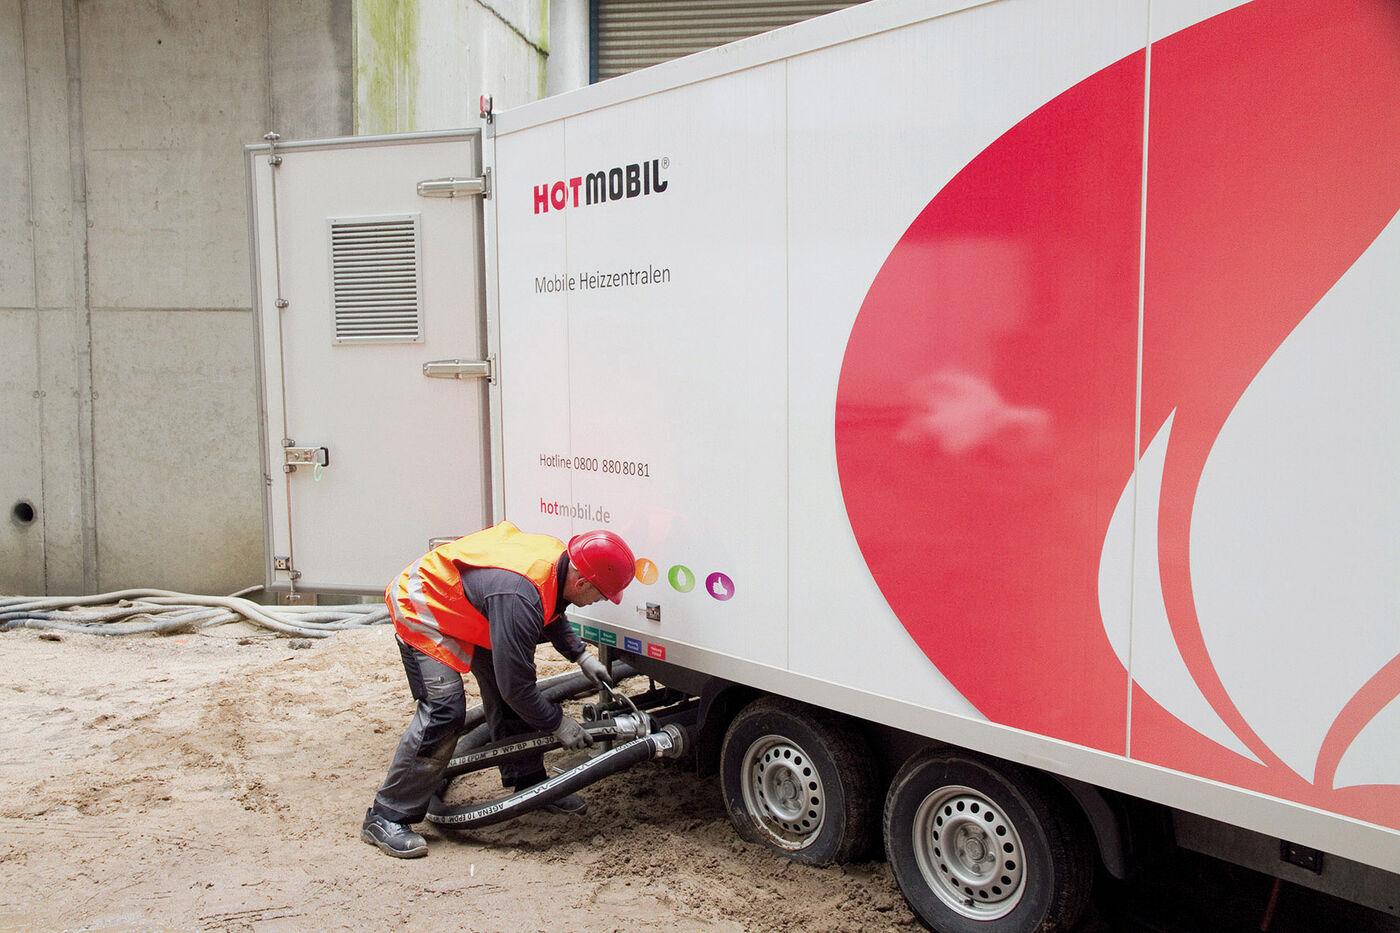 SERVICETECHNIKER WÄRME - SCHWEIZ (M/W/D) - Job - Hotmobil Deutschland GmbH - Karriereportal - Post offer form